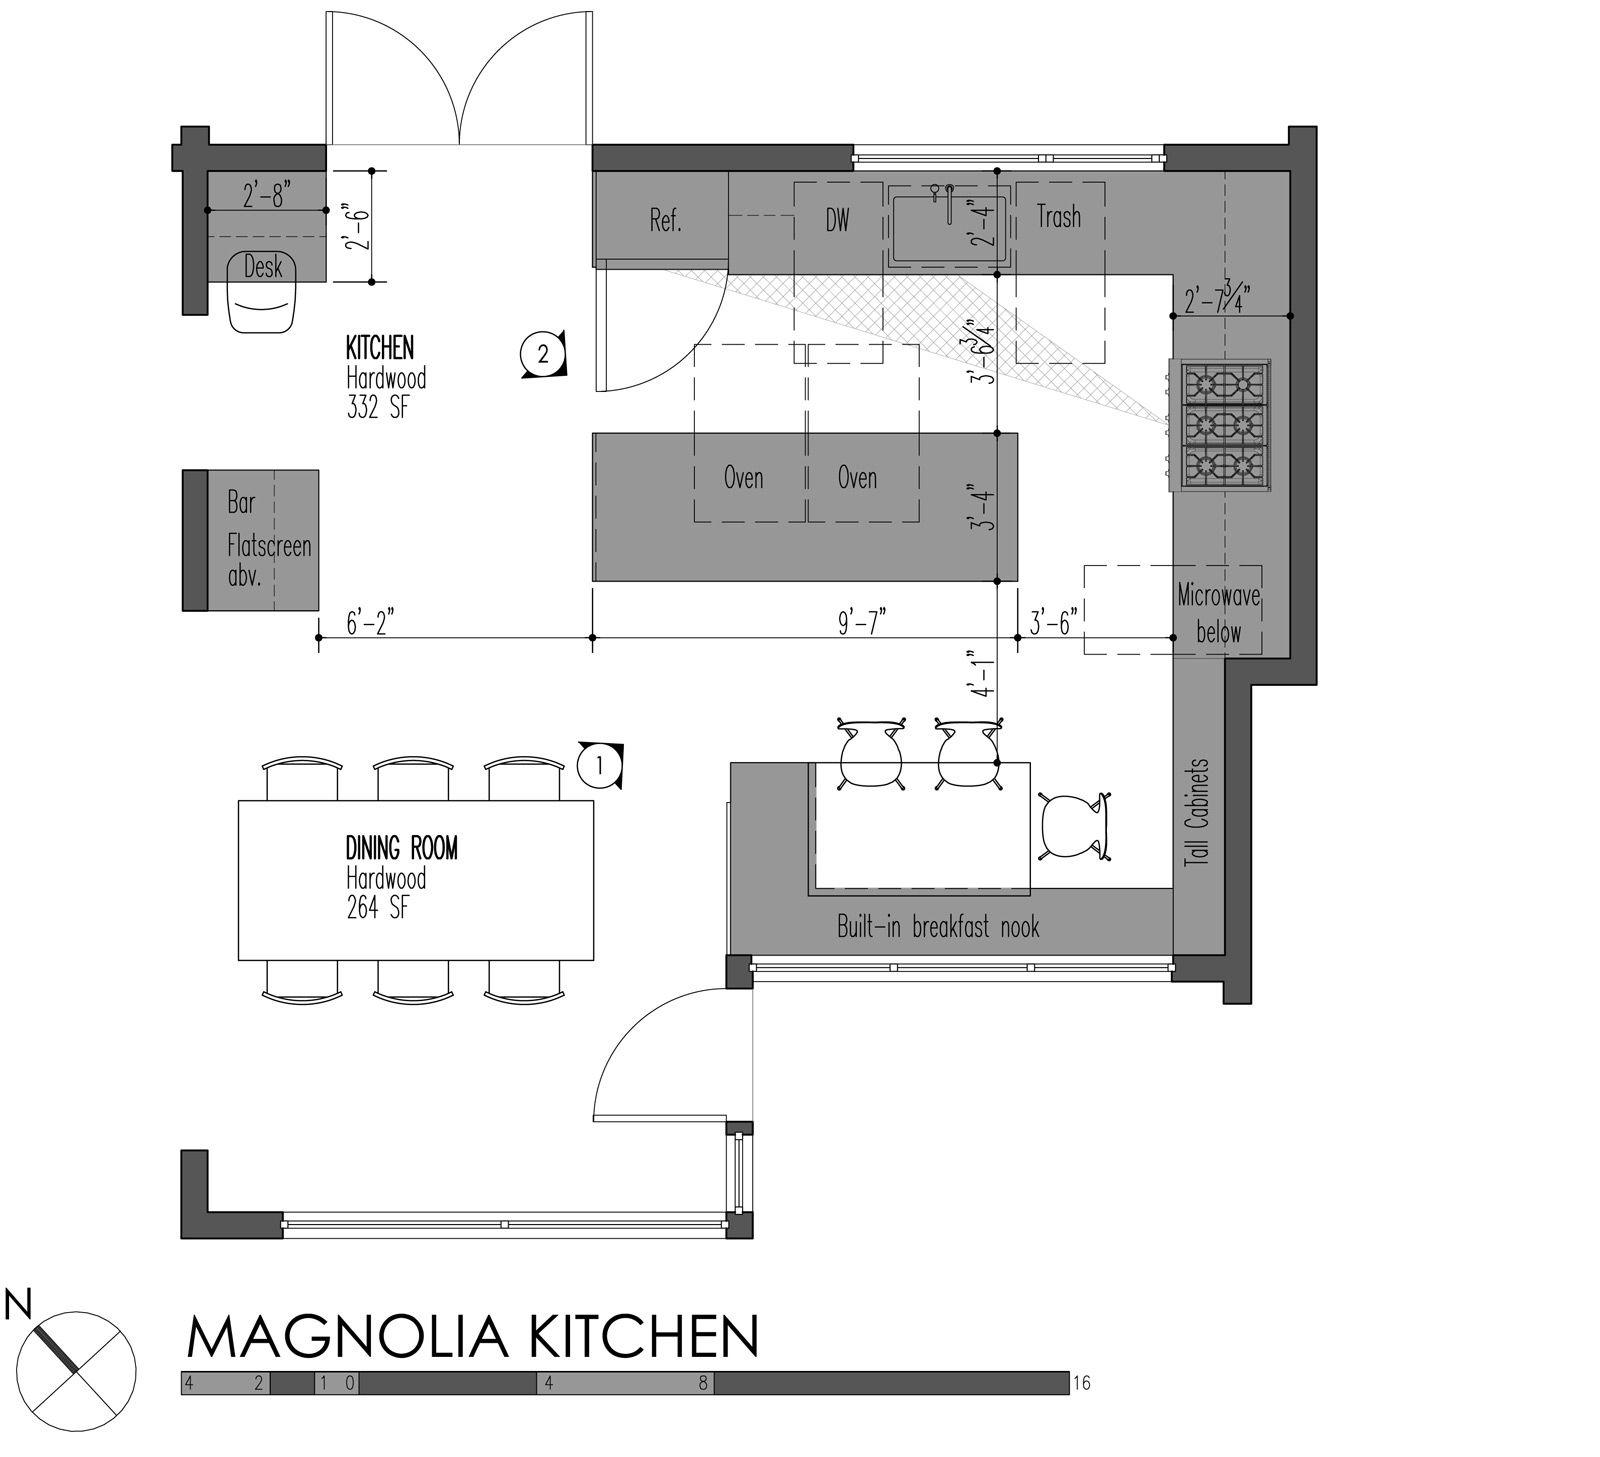 Standard Kitchen Island Size navigatorspbfo Pinterest